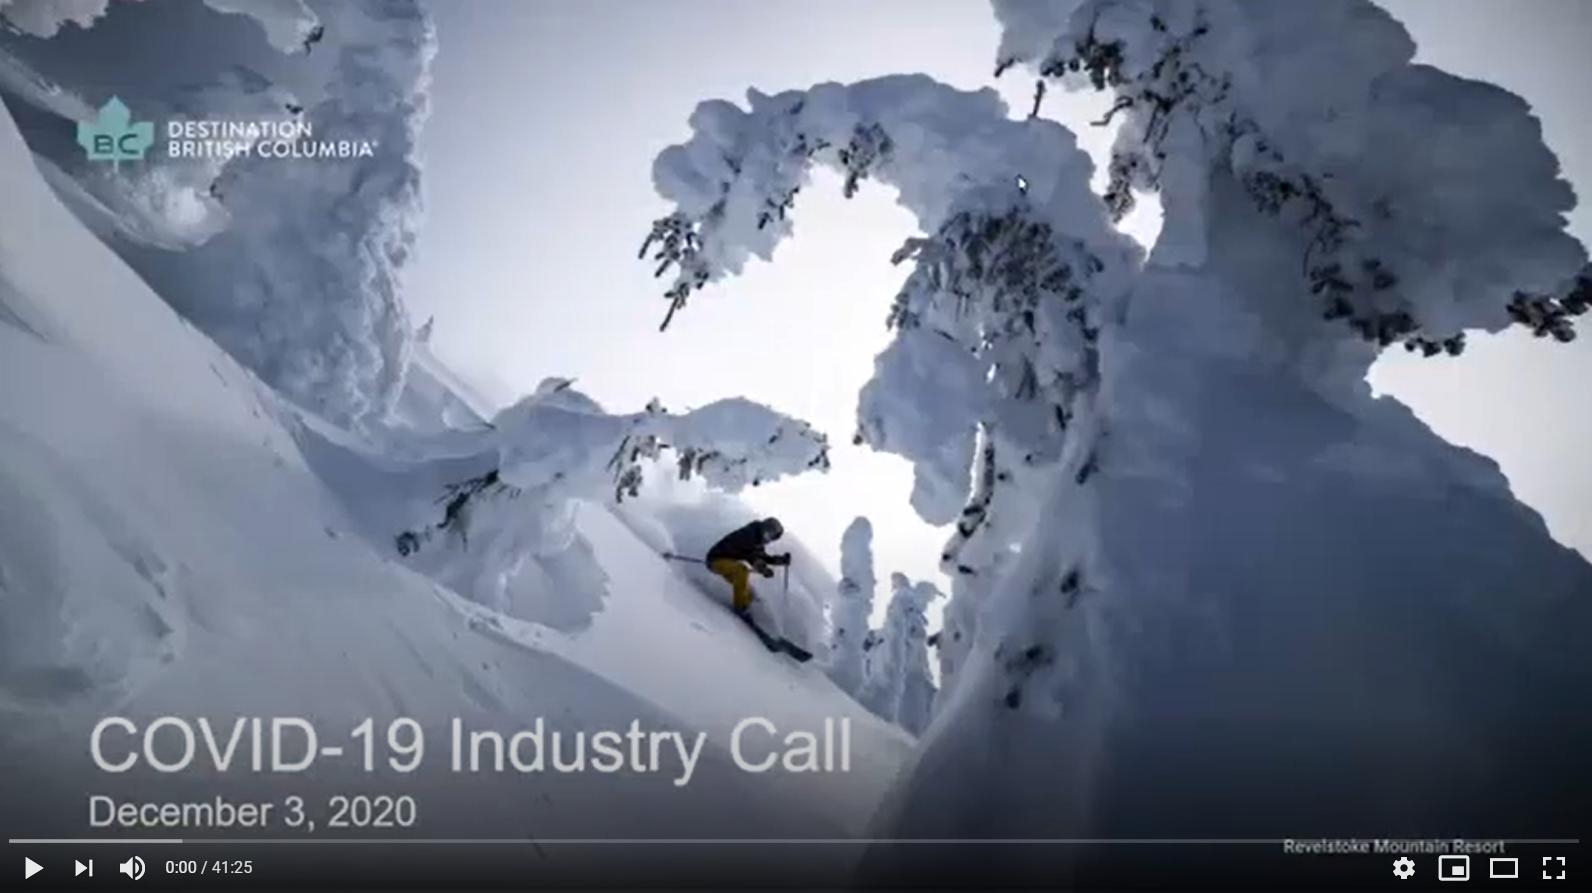 Destination BC December 3 Industry Call